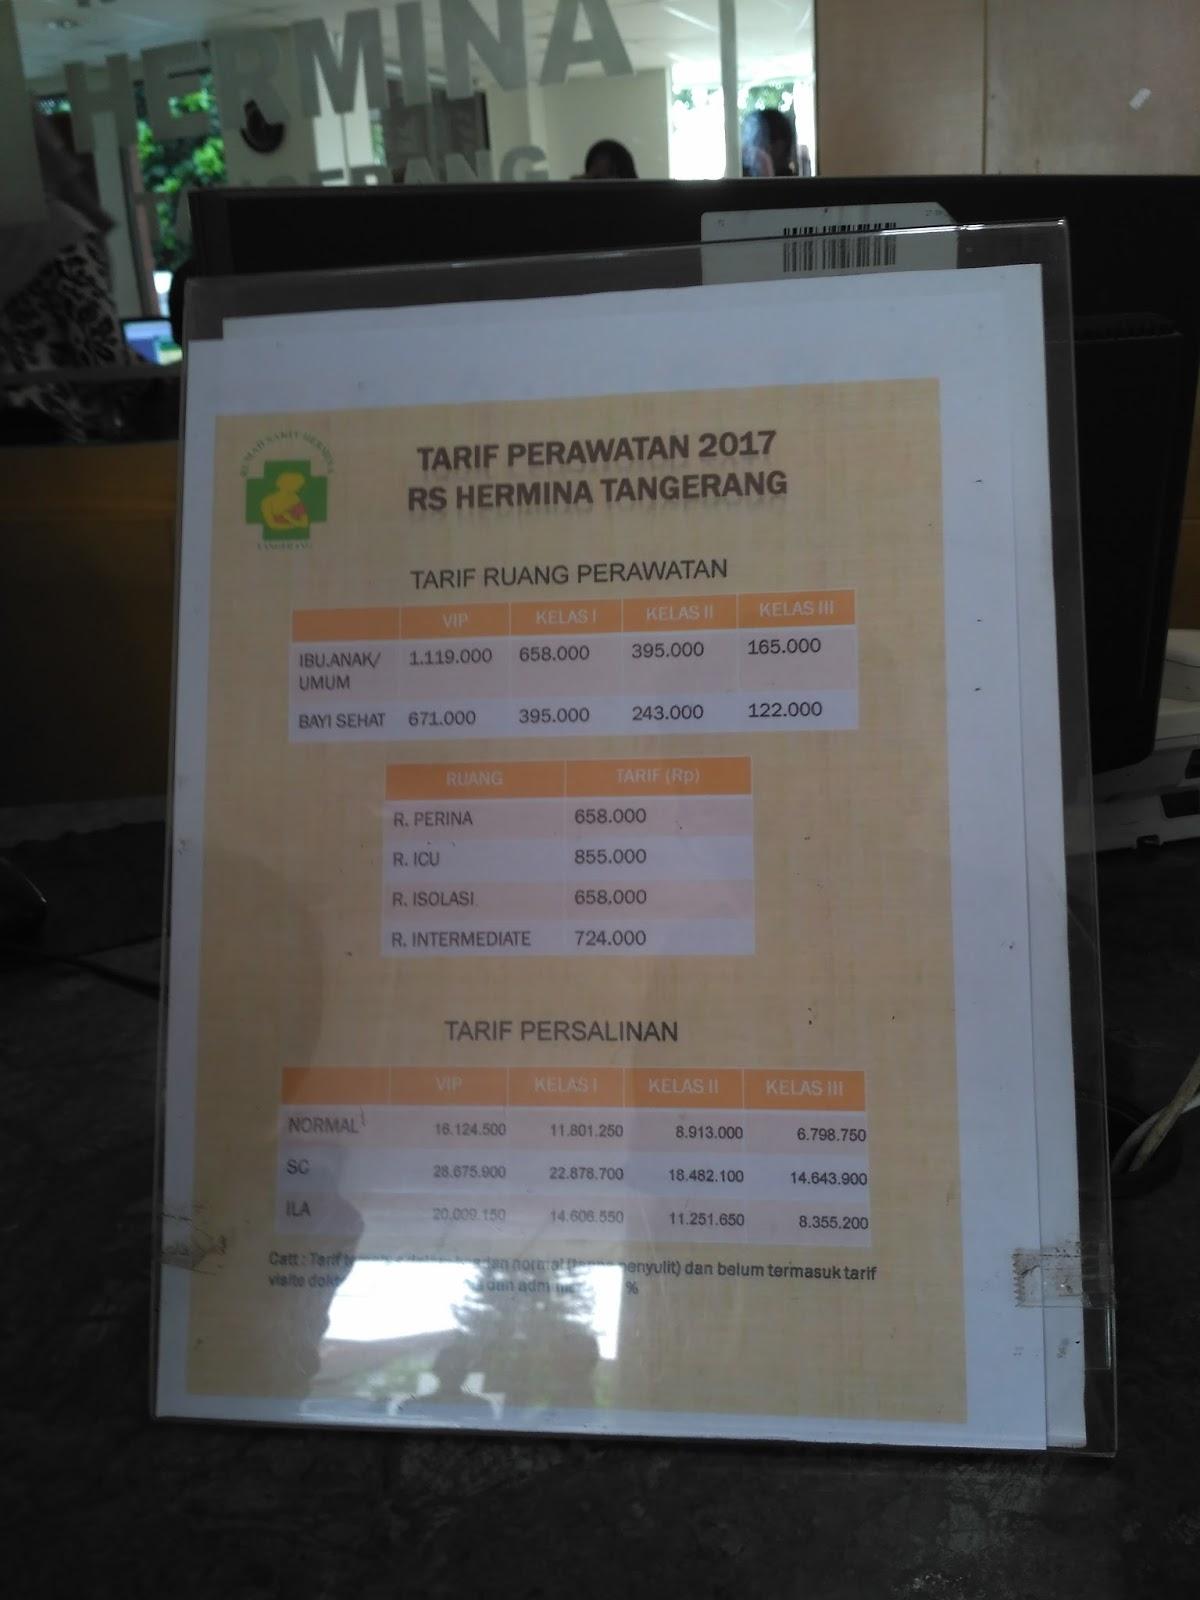 Biaya Persalinan RS Hermina Tangerang | Penaaksi.com ...